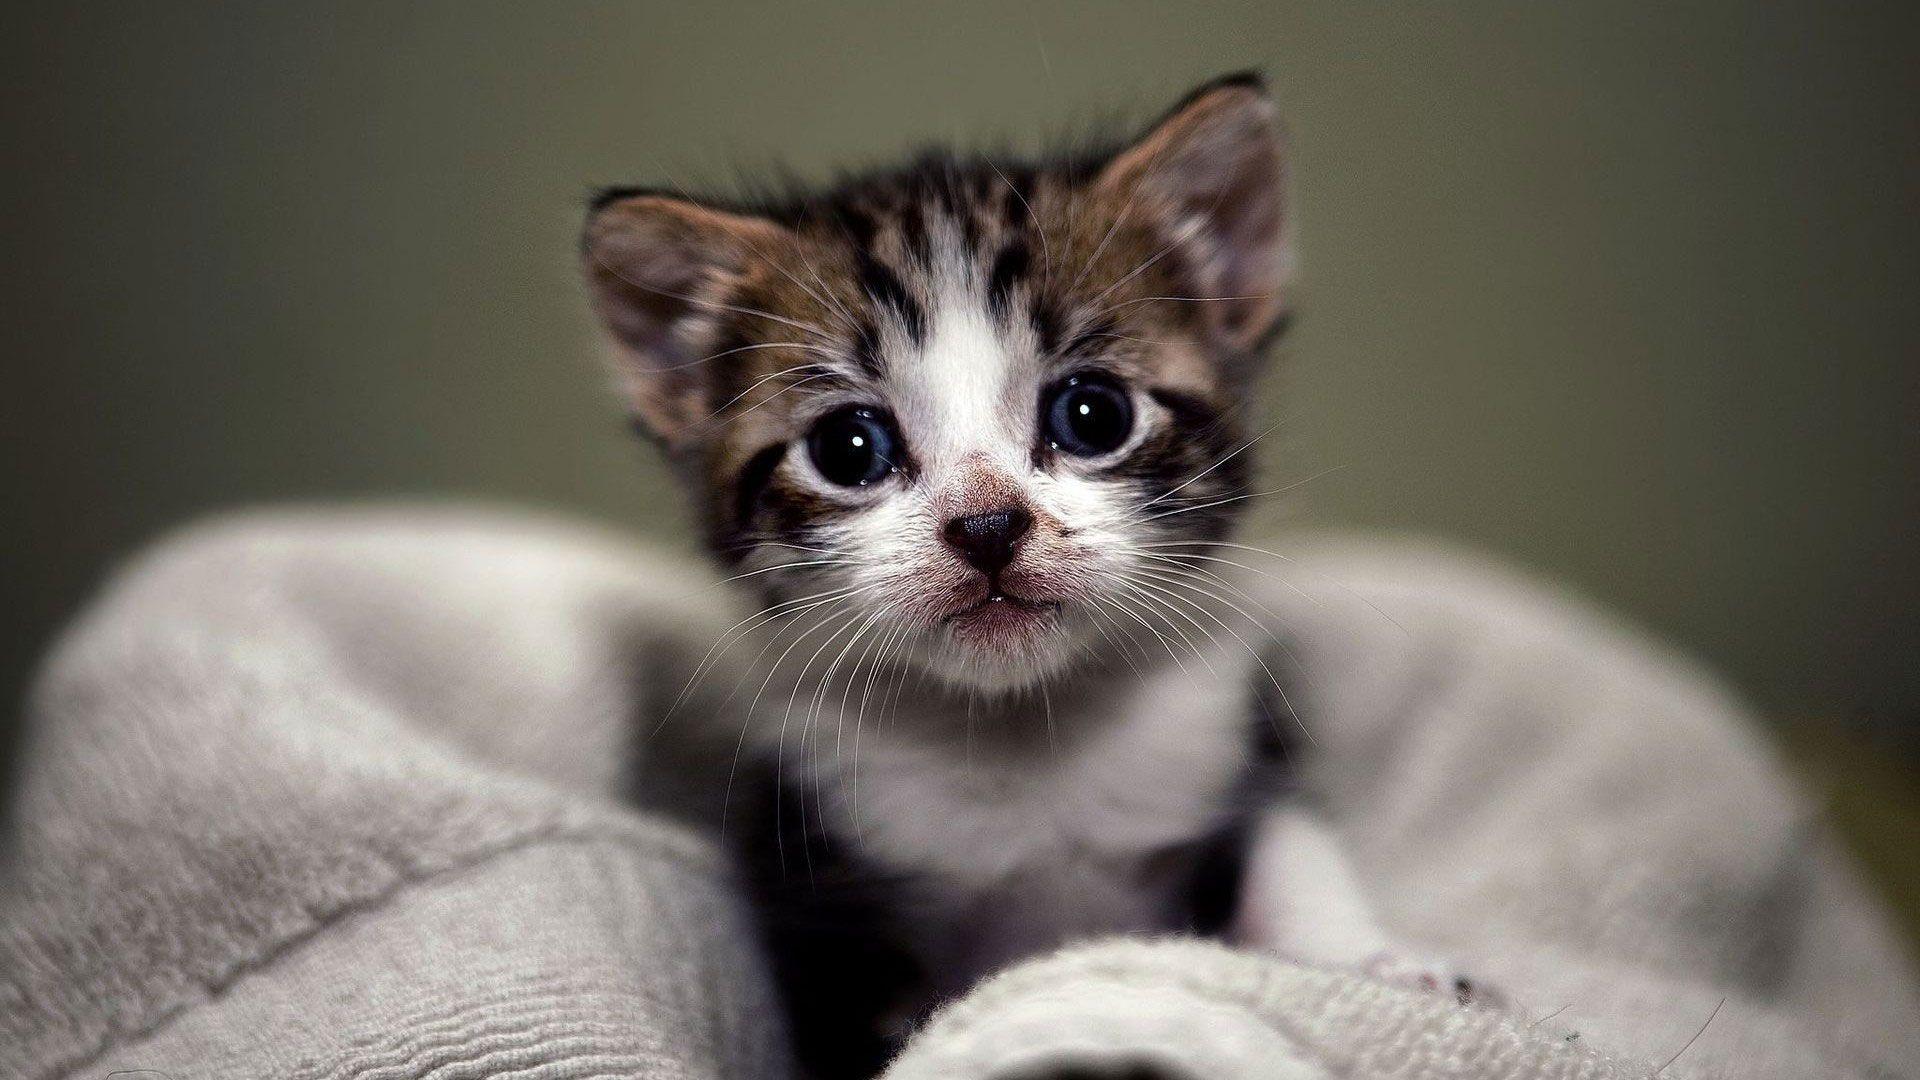 Hd Pics Photos Cute Small Kitten Close Up Hd Quality Desktop Background Wallpaper Kittens Cutest Cats Cute Kittens Images